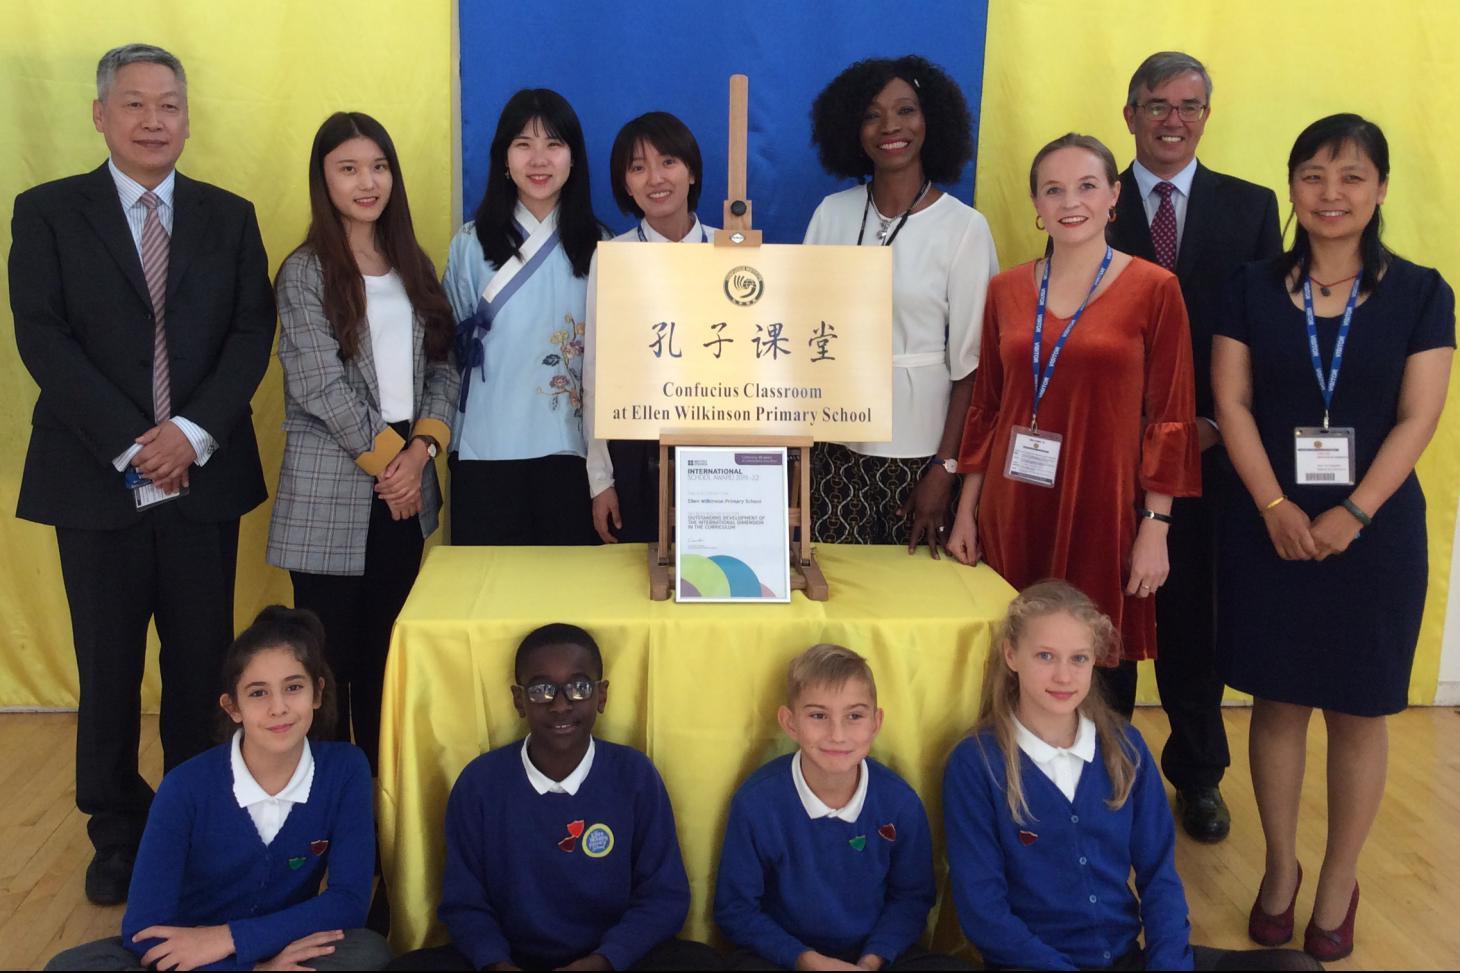 Confucius Classroom Award